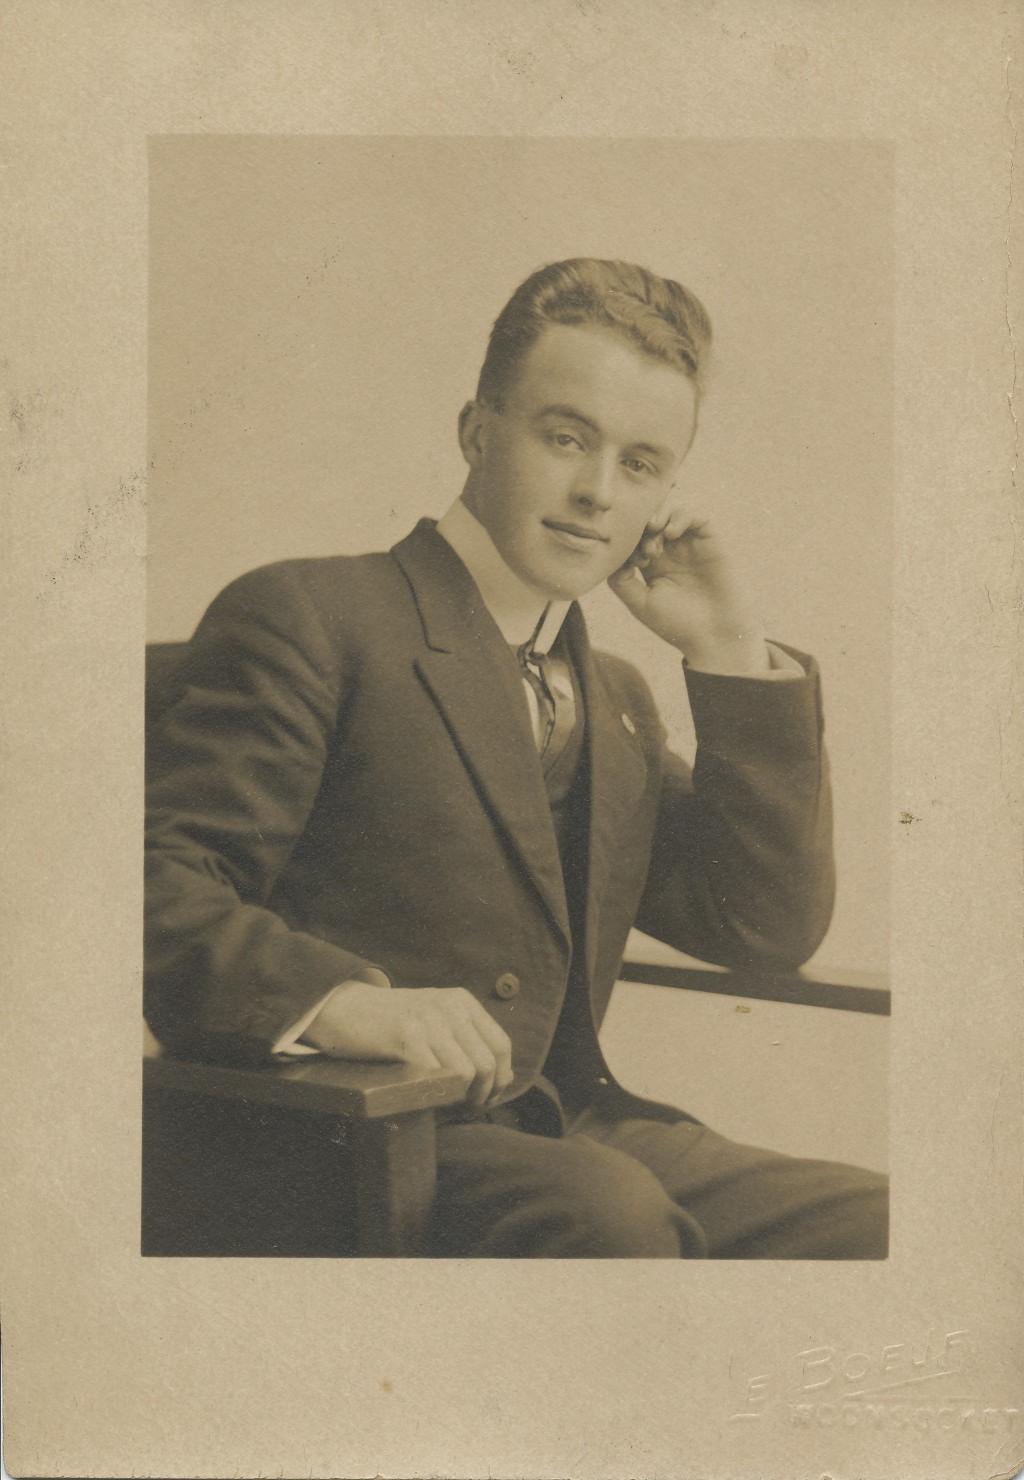 Young William Sheehan